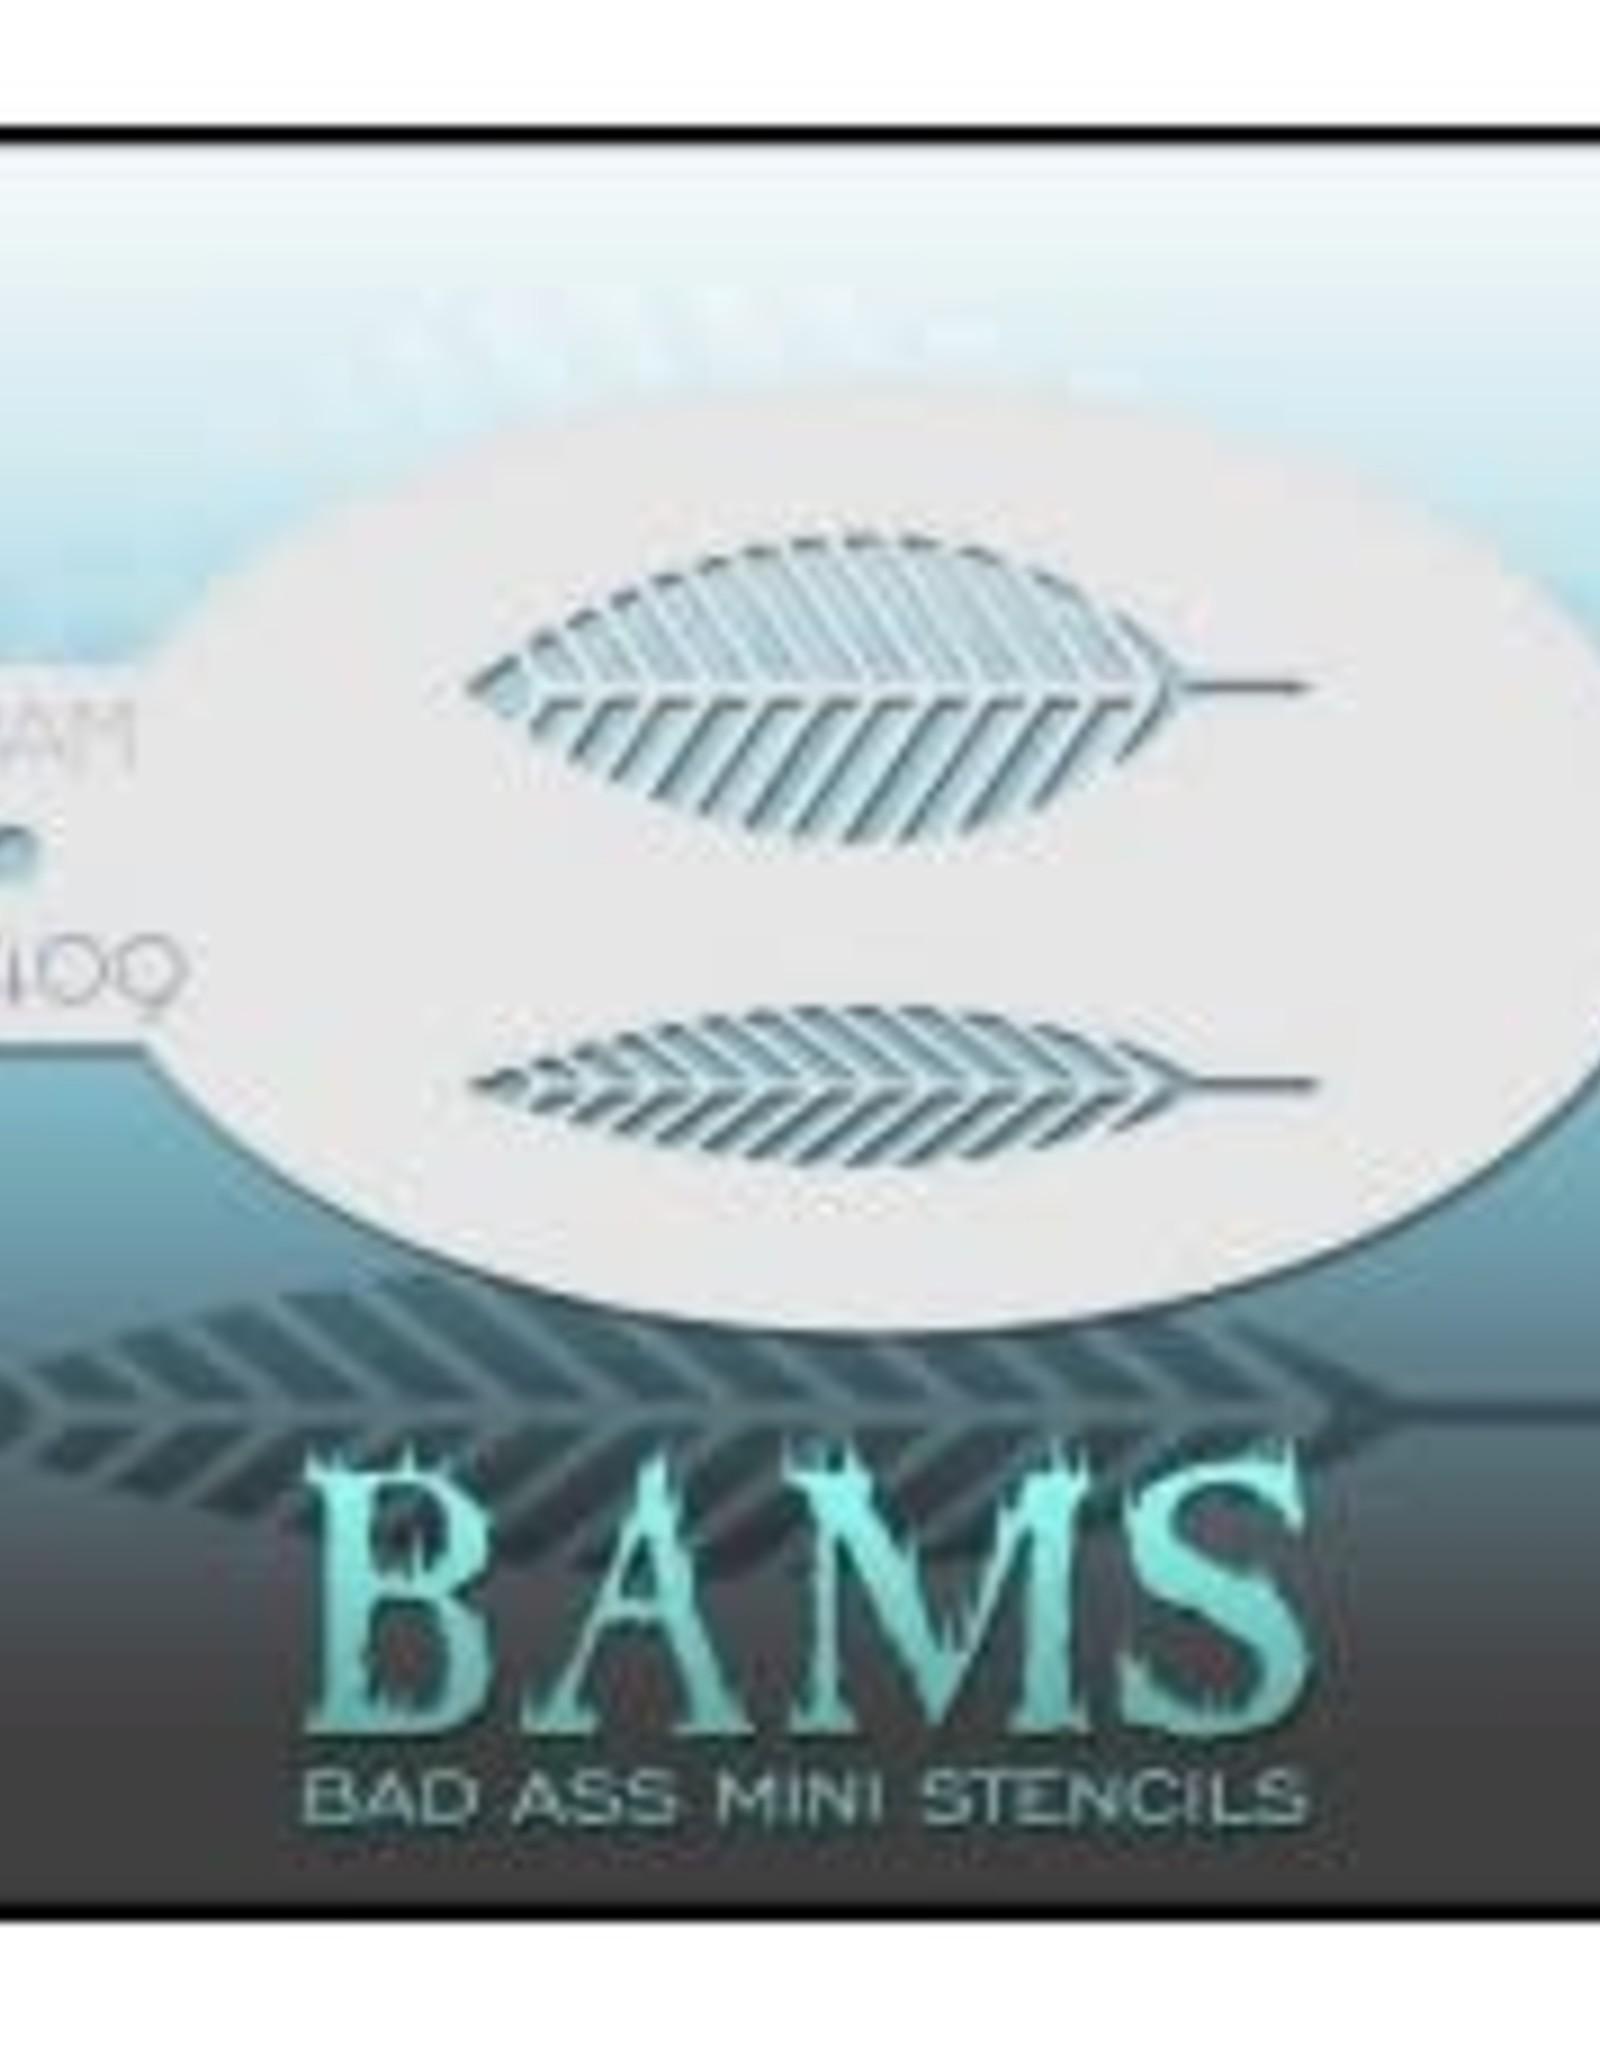 Bad Ass Stencils Bad Ass Mini Stencil - BAM1409